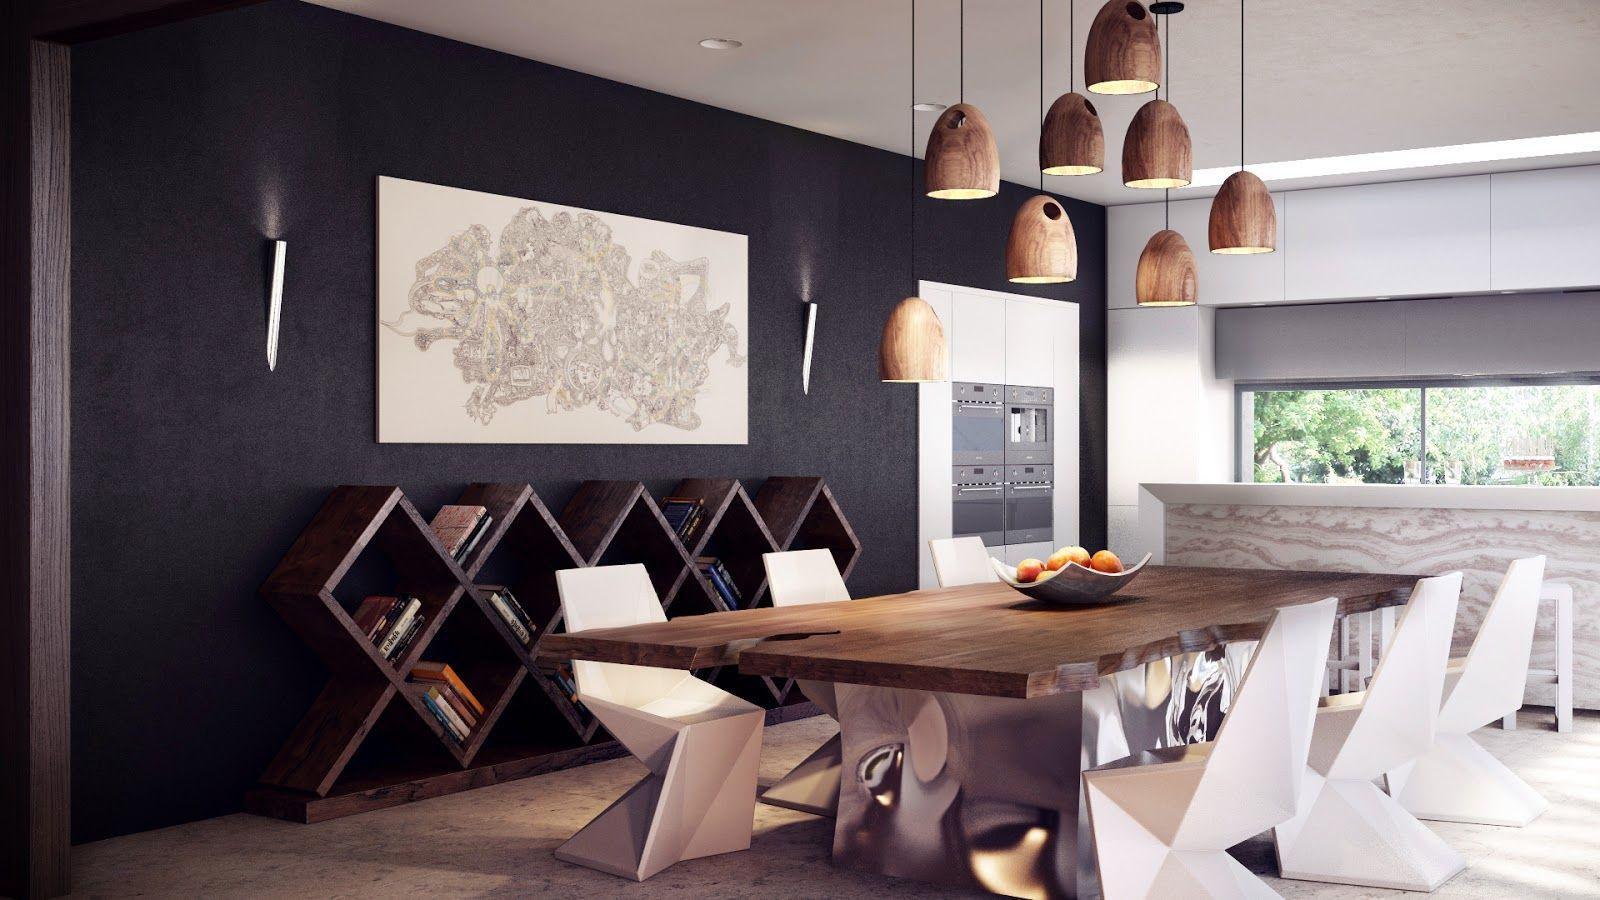 Chandelier  Tyler Creek House Interior  Pinterest  Shelves Cool Modern Lighting Fixtures For Dining Room Design Decoration